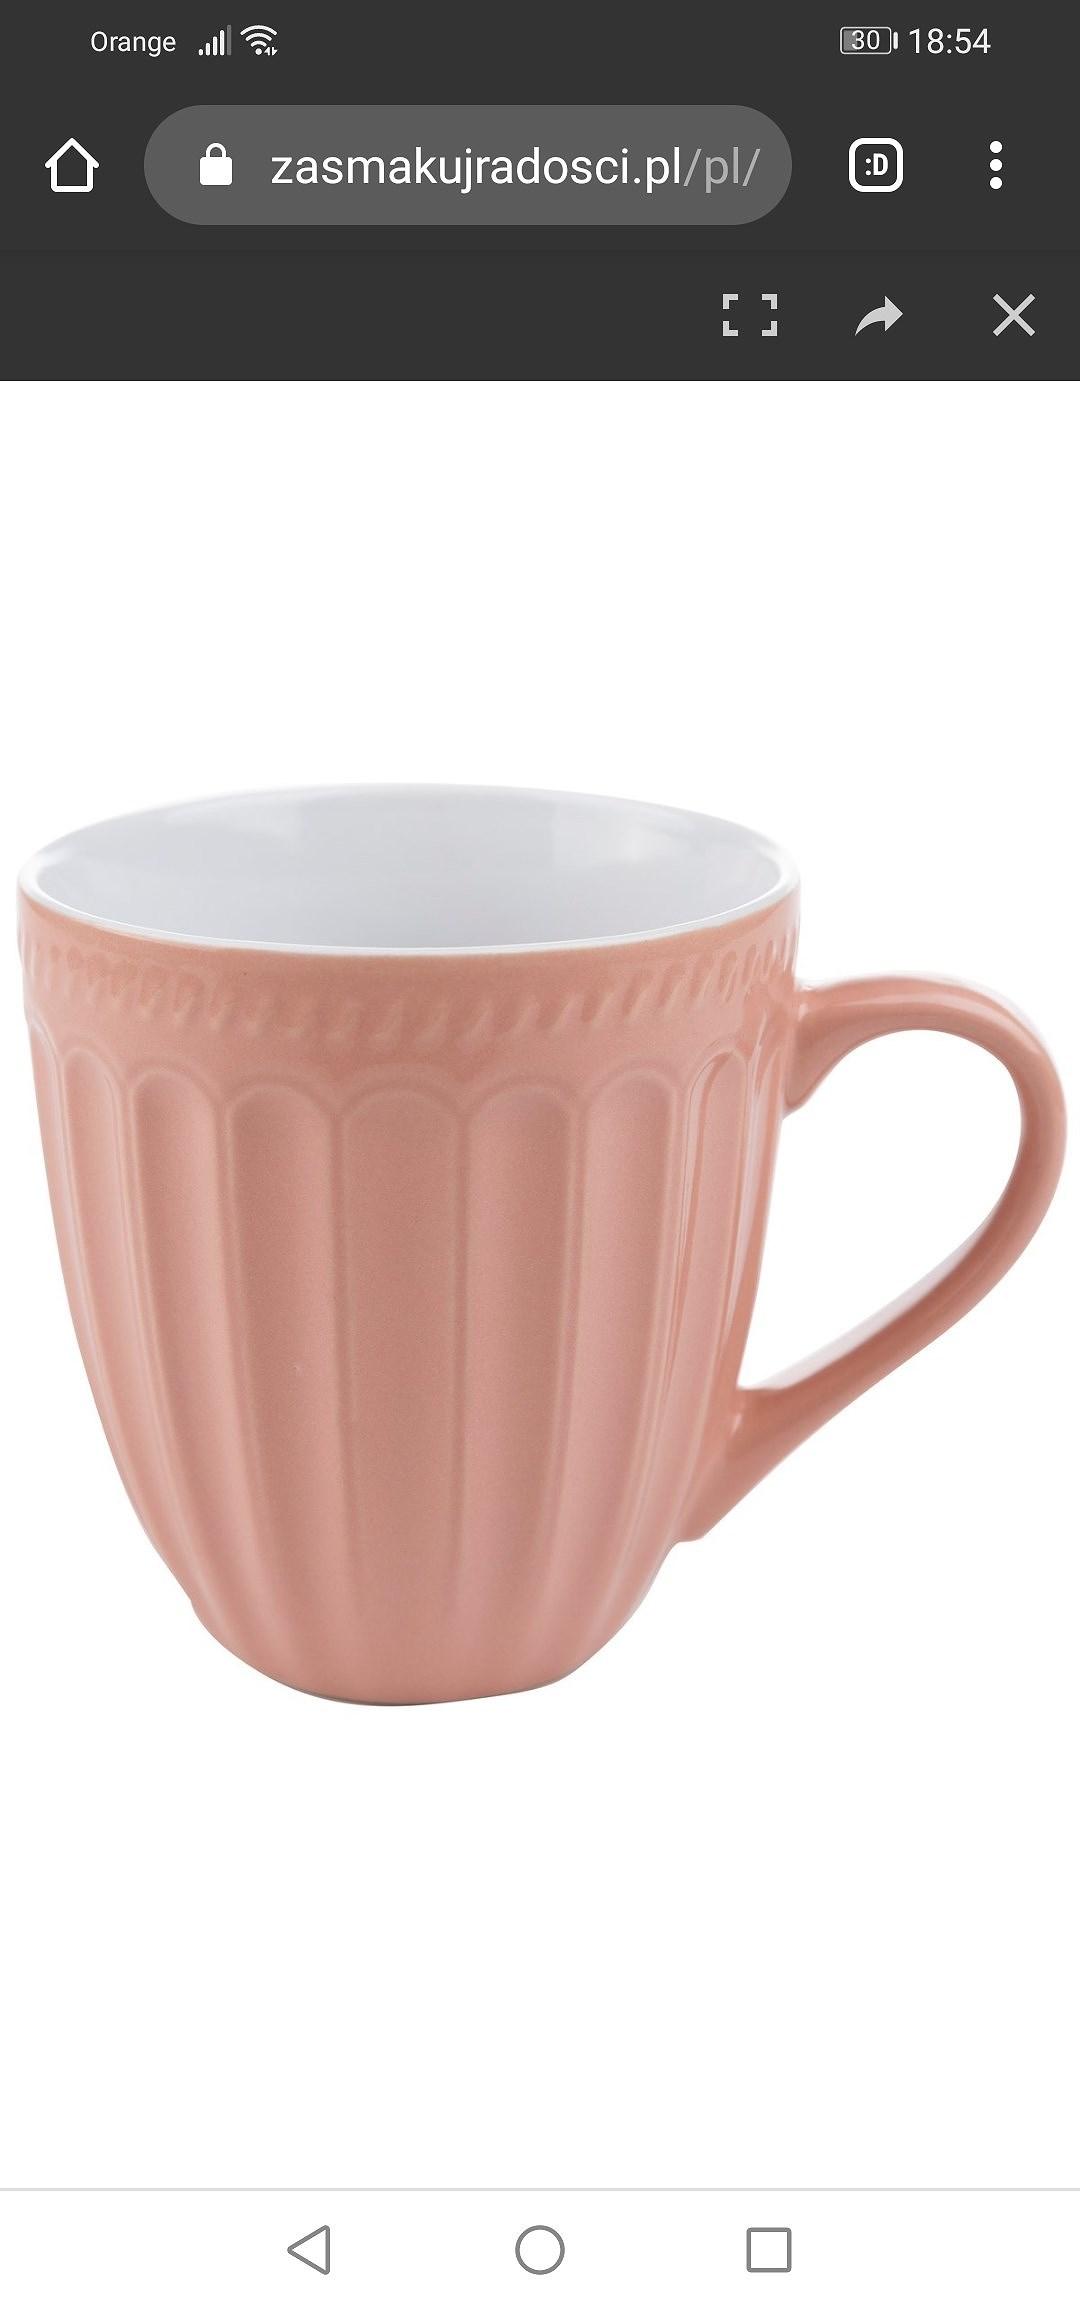 https://zasmakujradosci.pl/pl/products/kubek-ceramiczny-florina-roma-rozowy-380-ml-3783.html